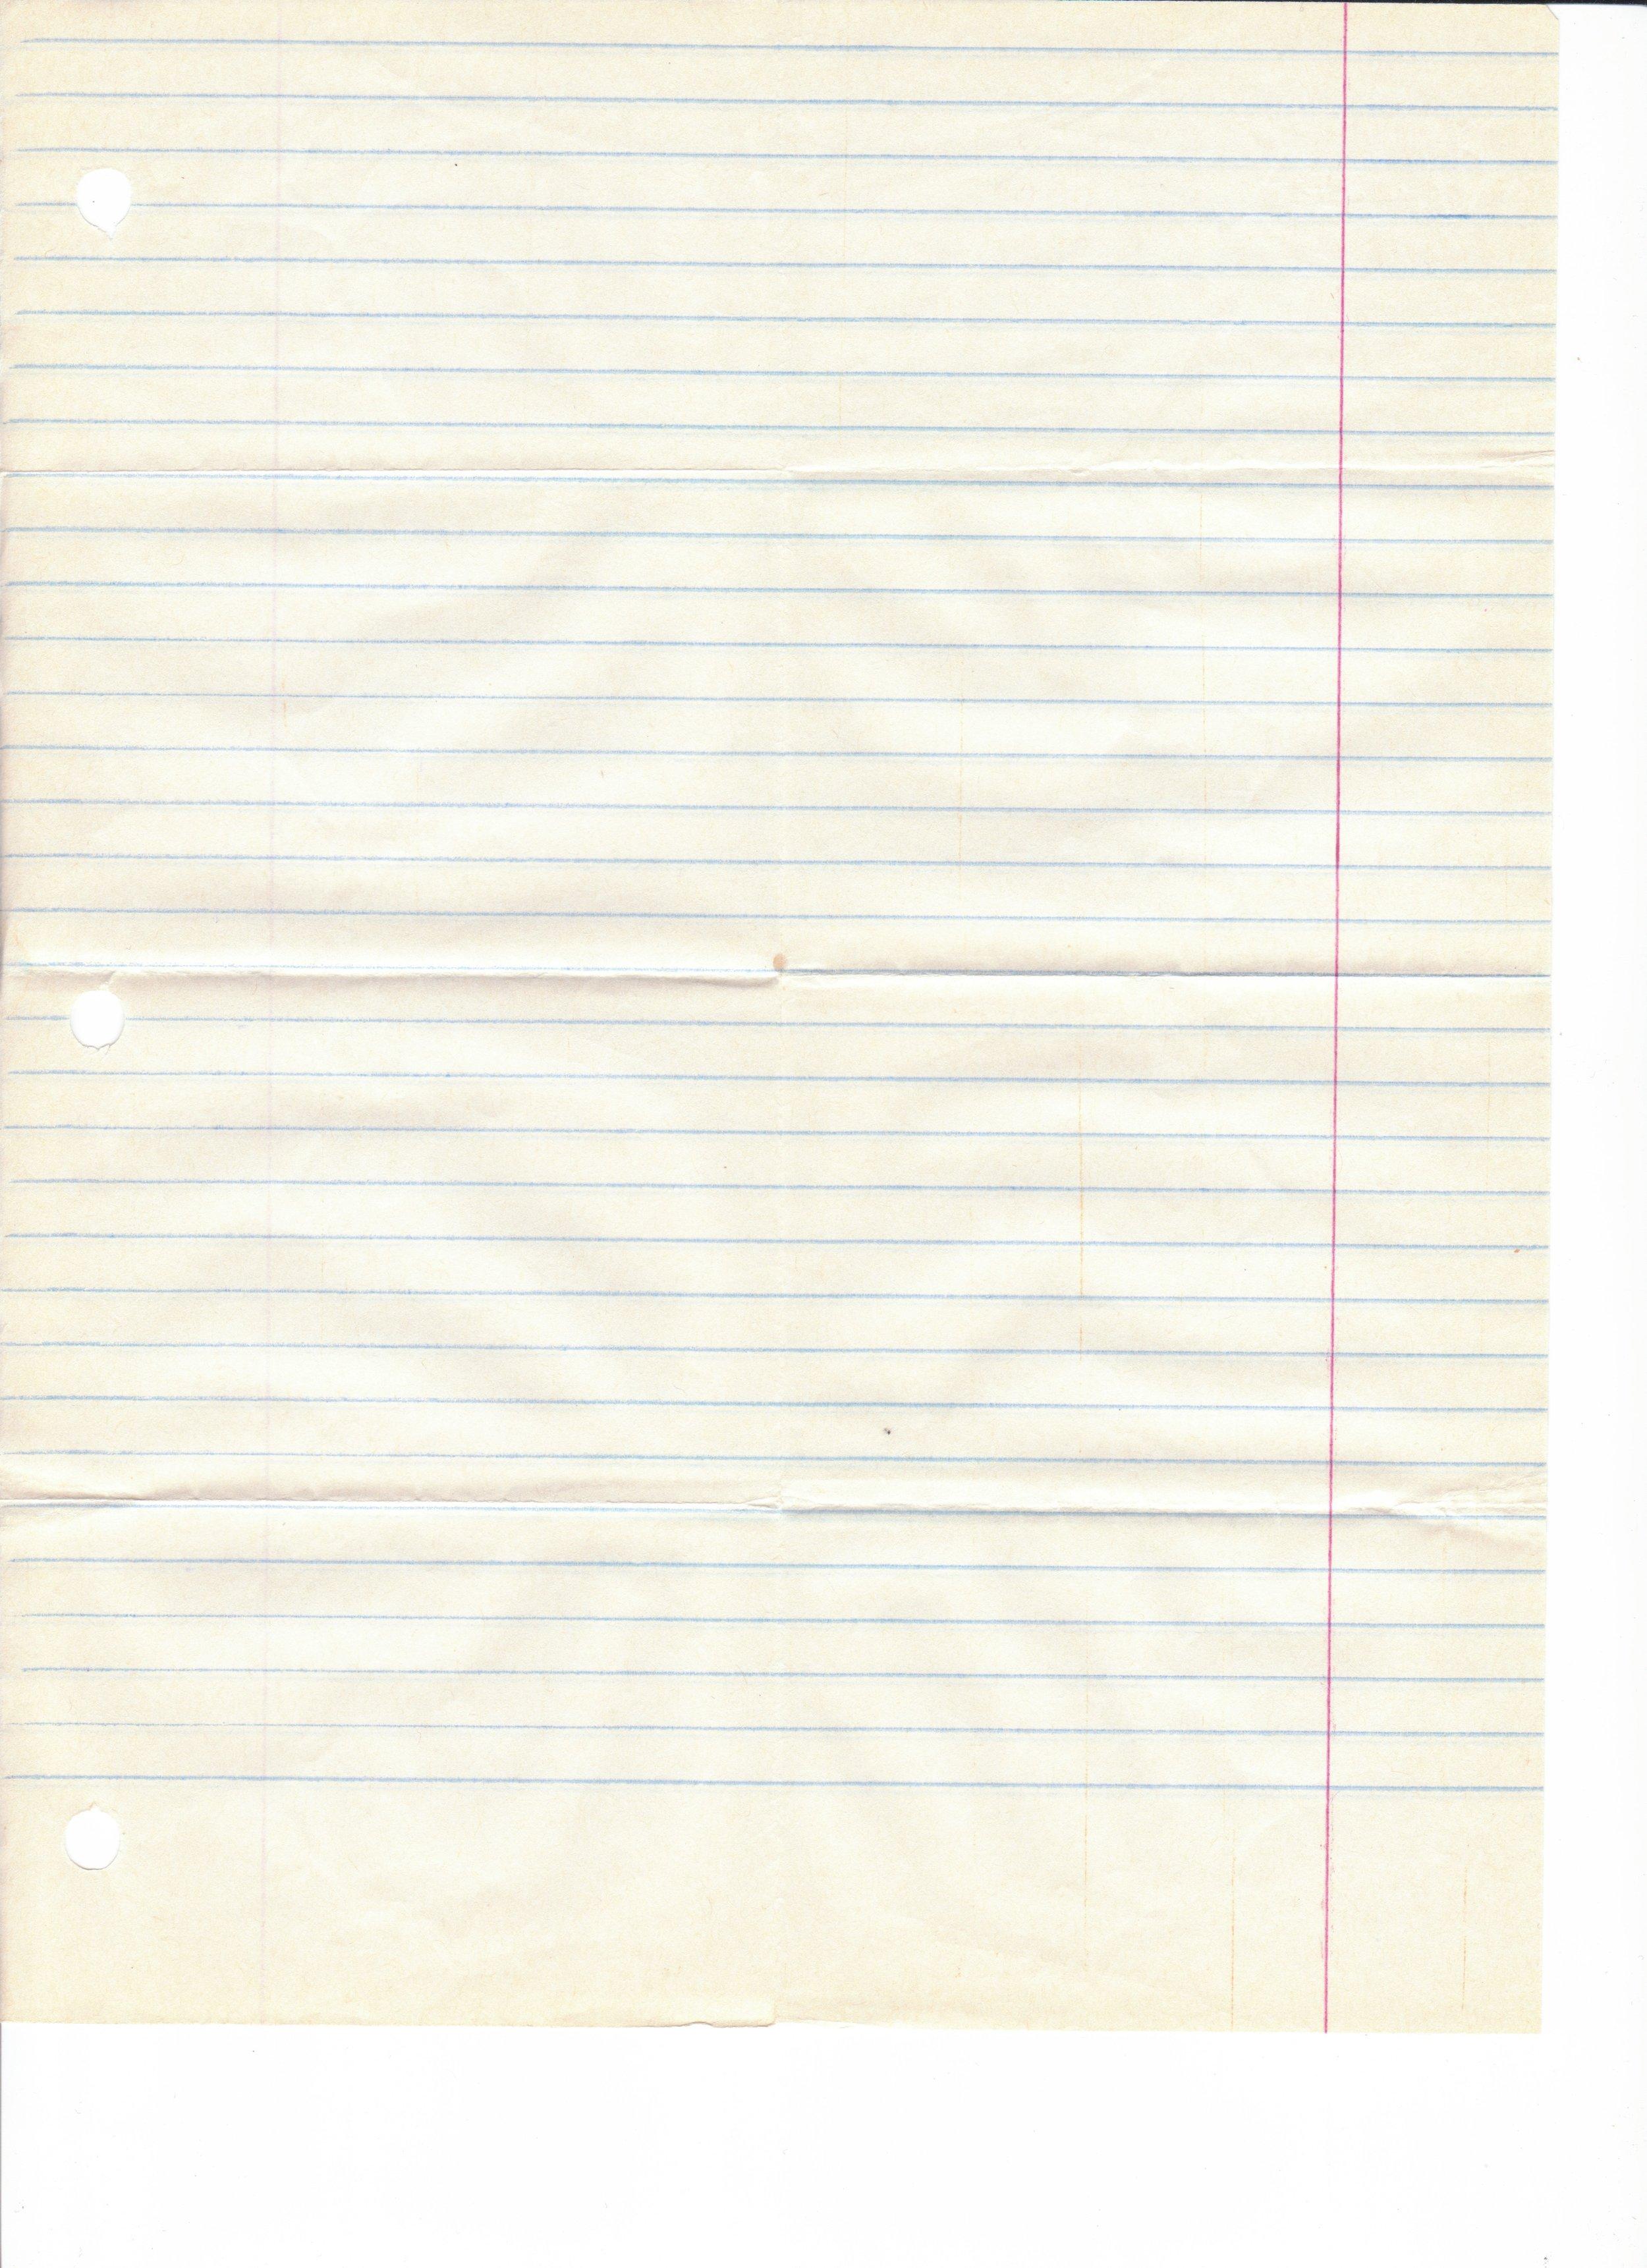 notebook5-v2_Page_116.jpg